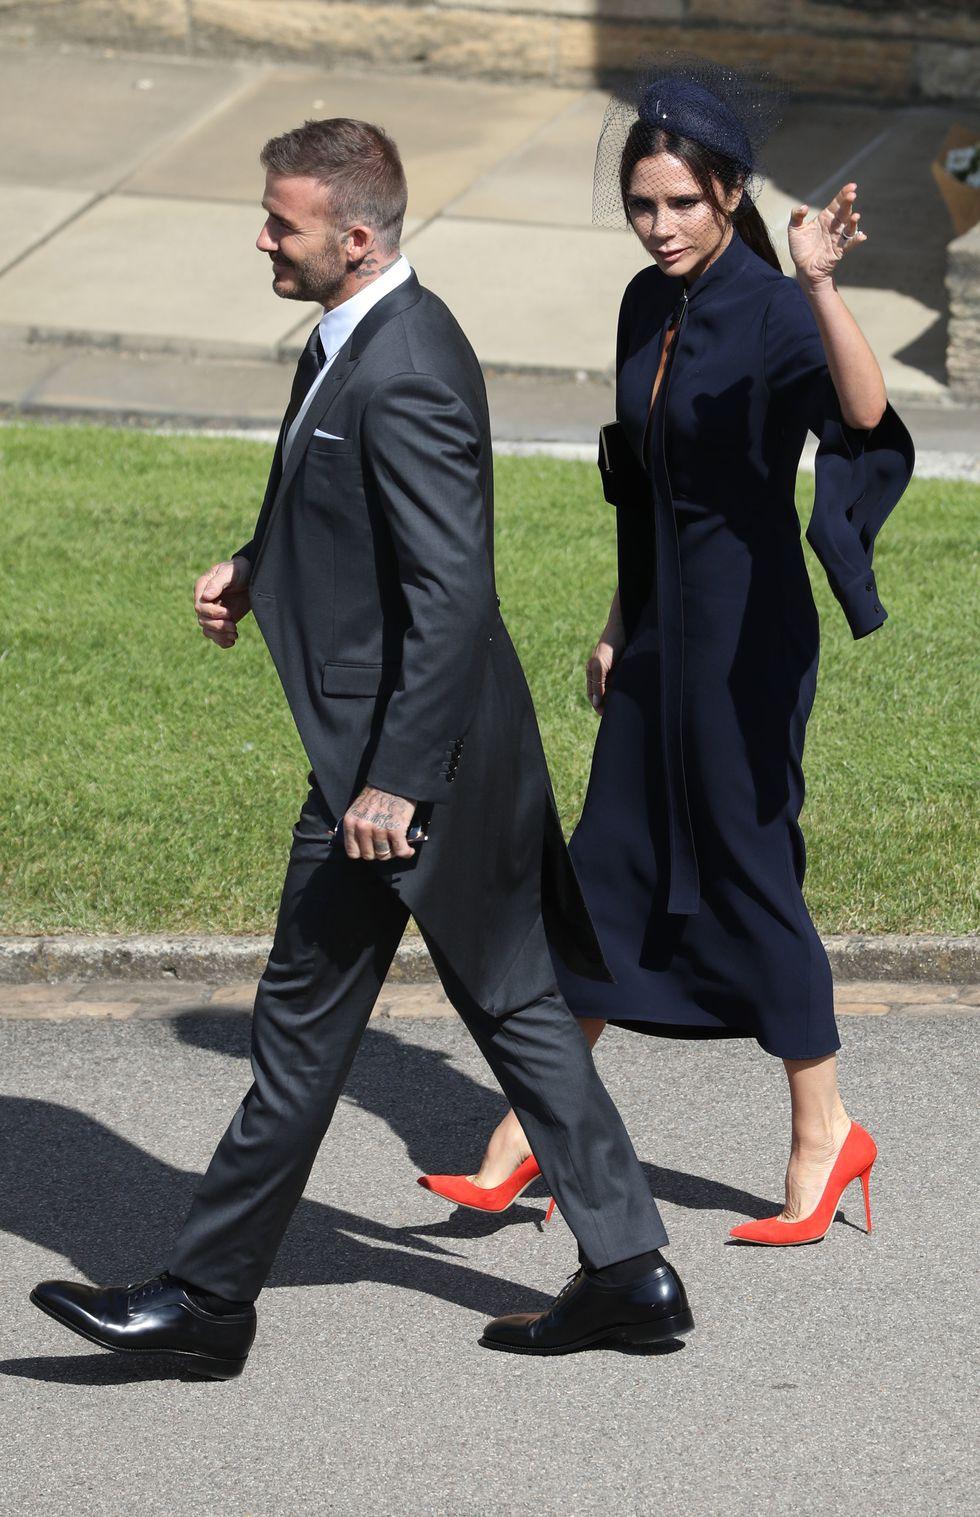 Le-scarpe-rosse-di-Victoria-Beckham-al-Royal-Wedding.jpg Wedding